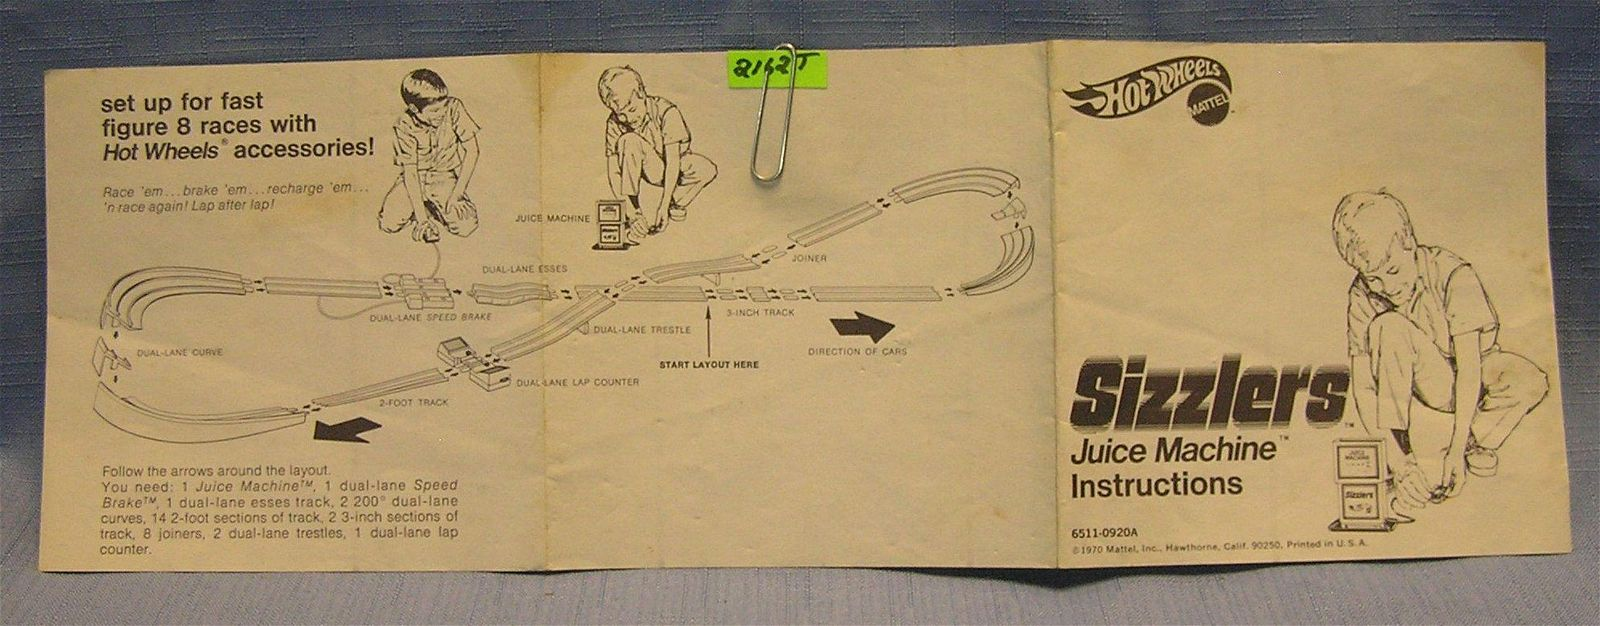 Original 1970 Hot Wheels Sizzler's brochure